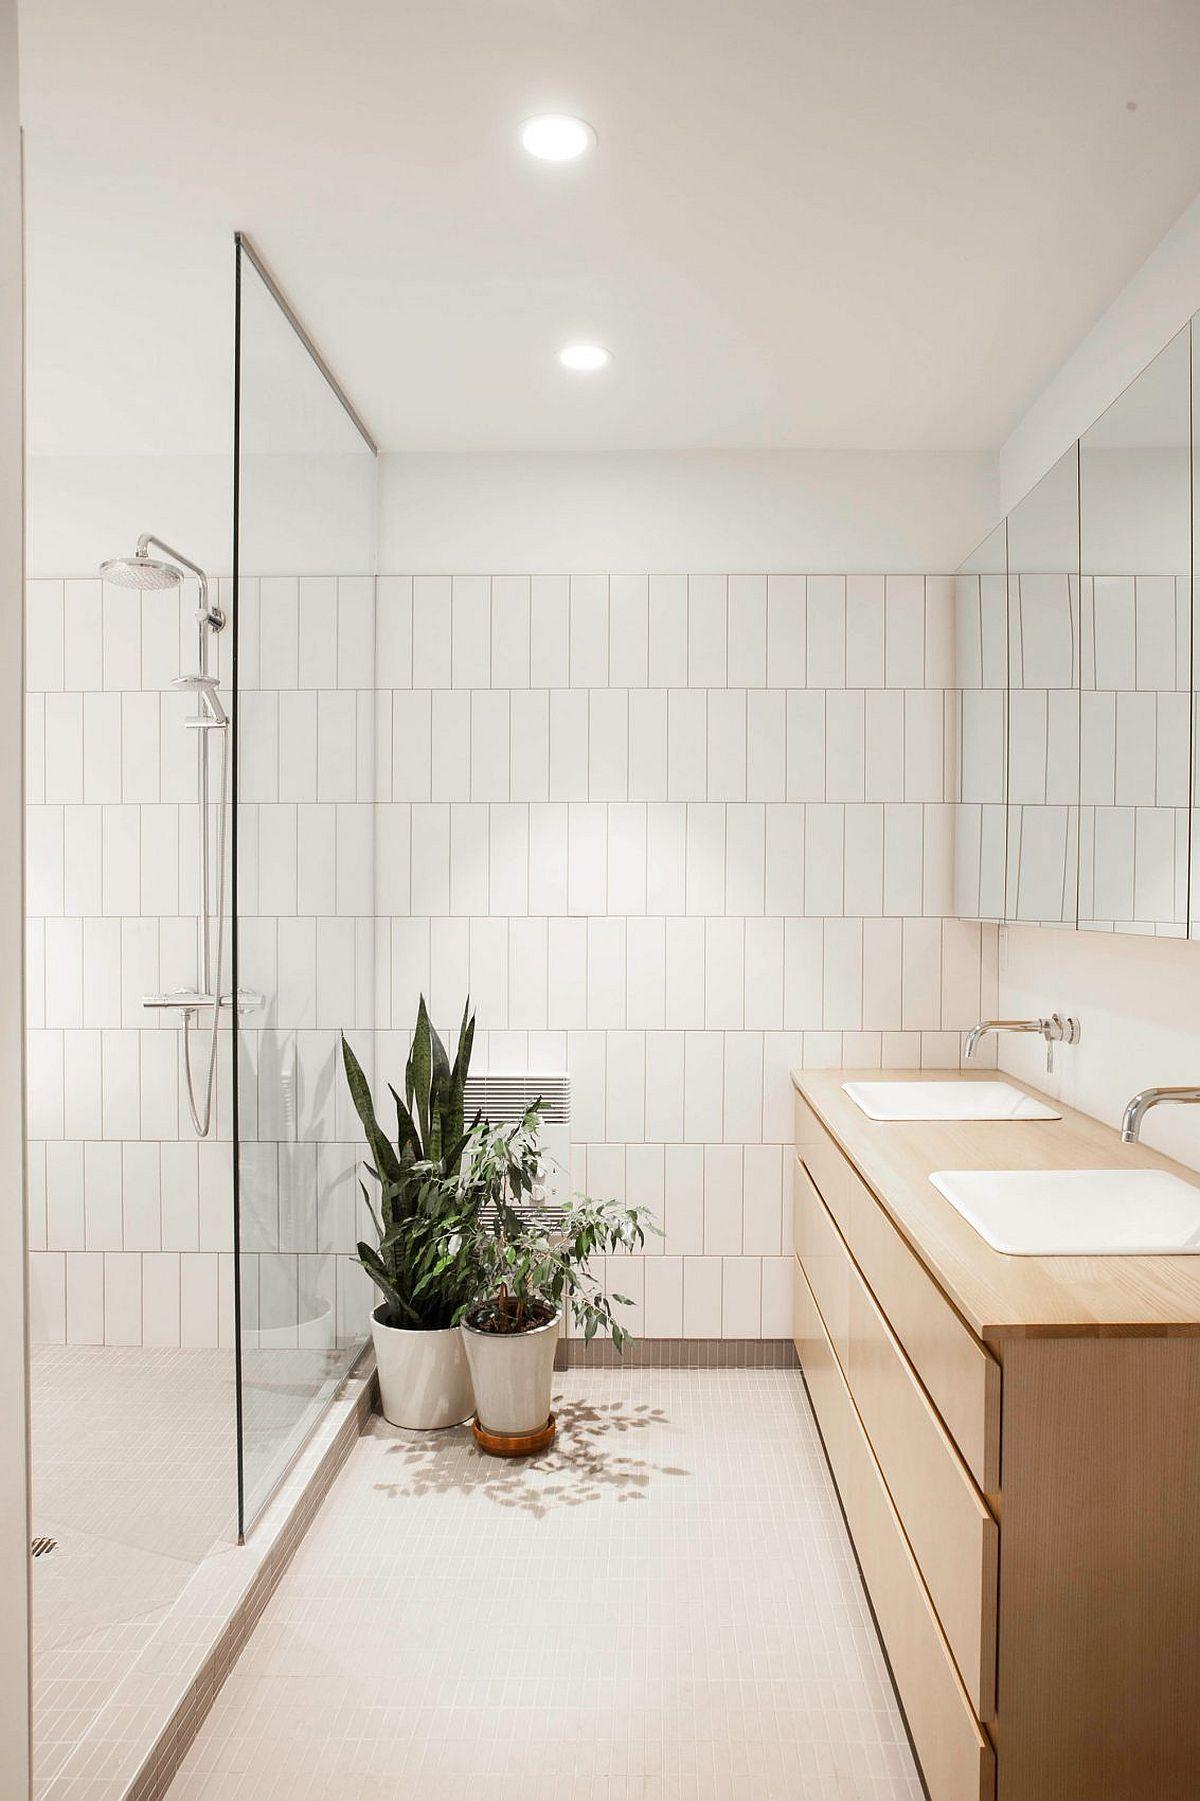 Wooden vanity for the light-filled bathroom in white